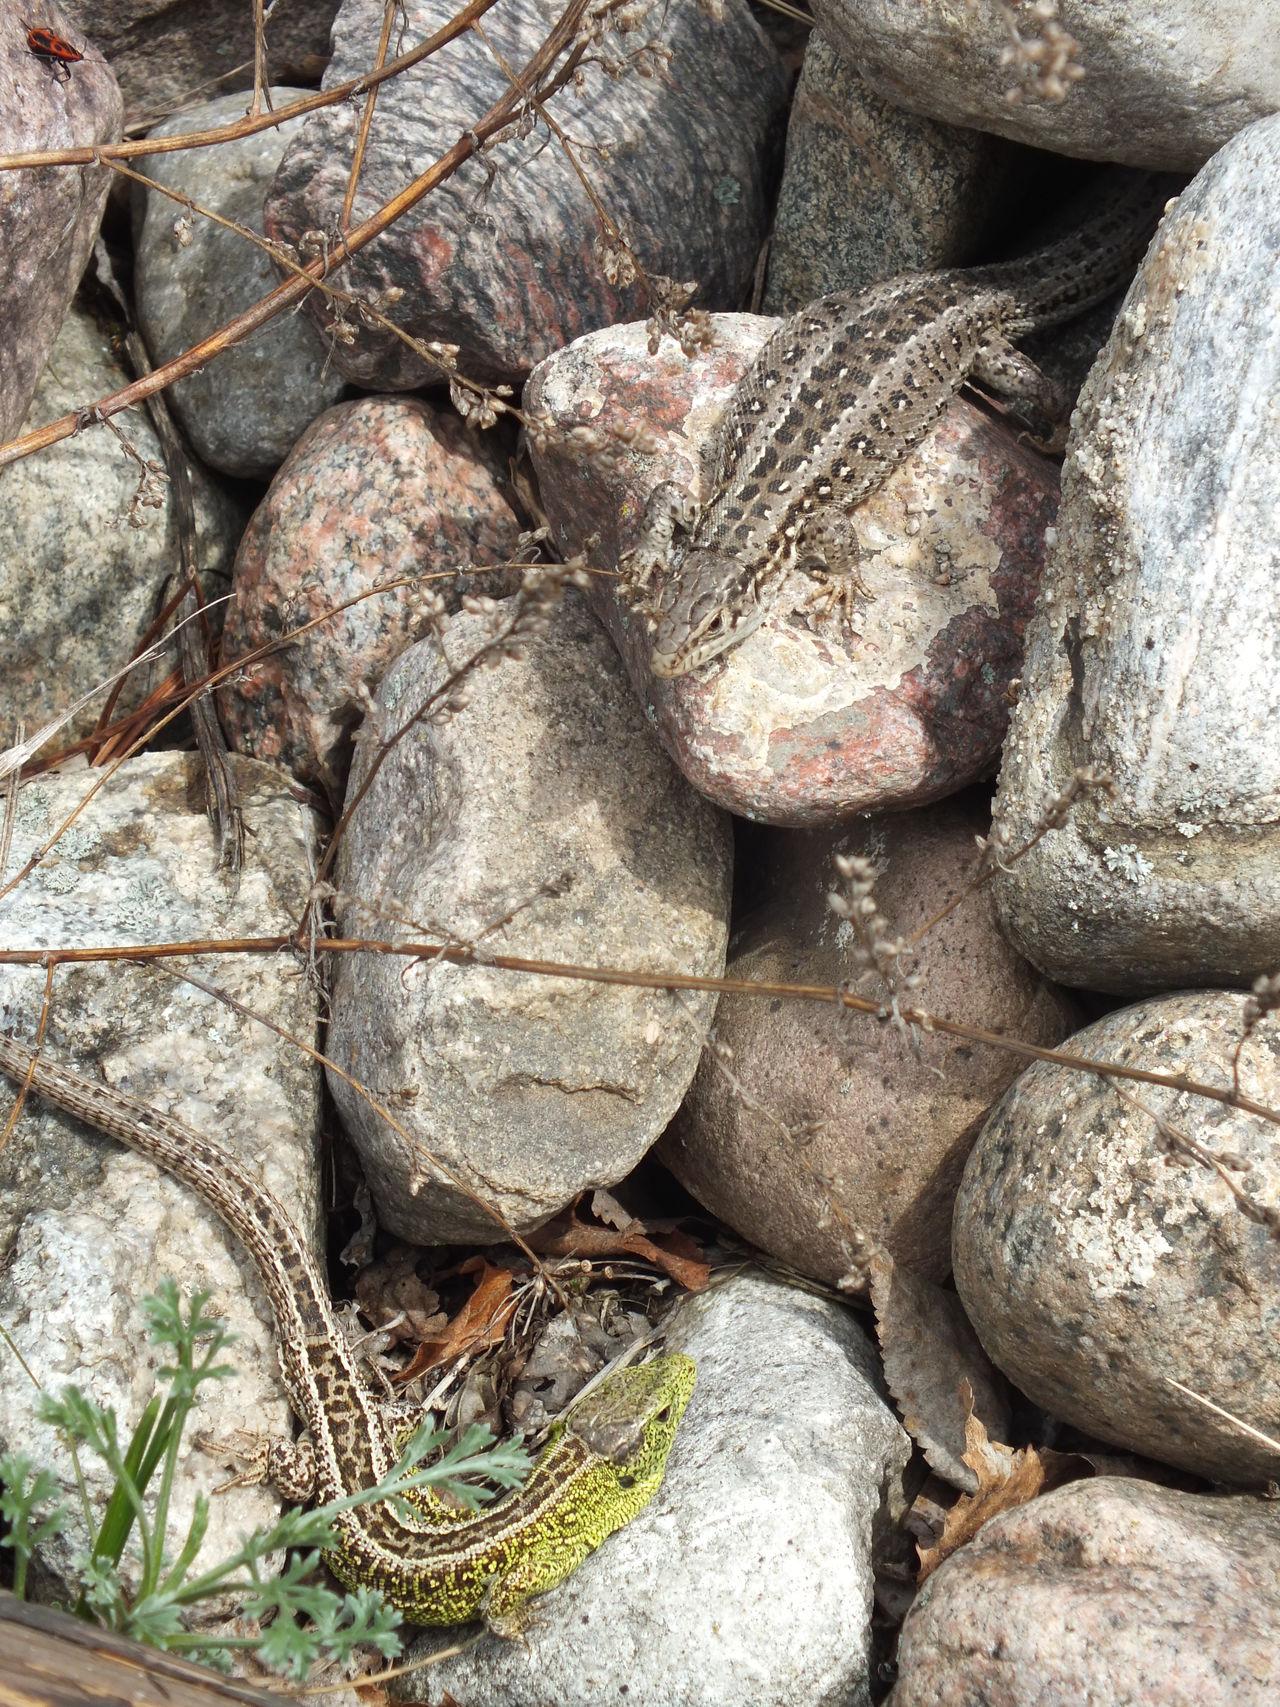 Lizard Lizard Close Up Lizard Nature Reptile Reptile Photography Stone